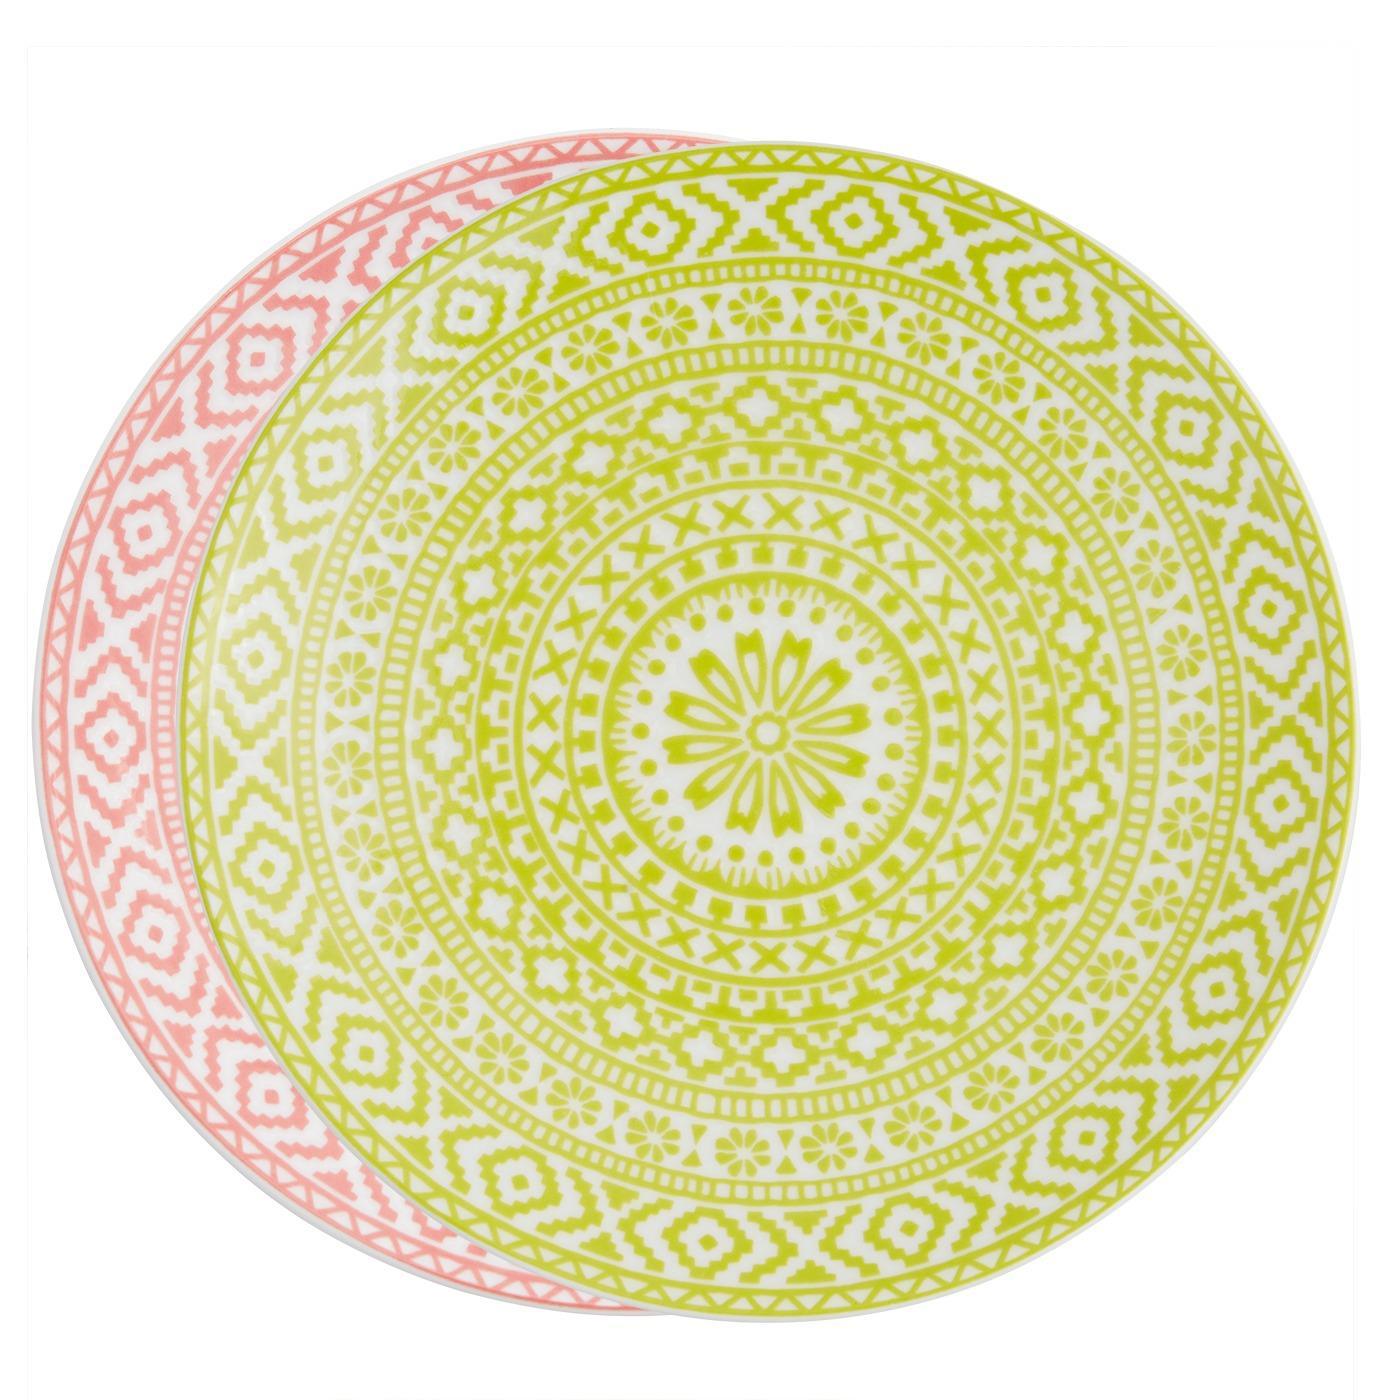 Mayan Plate 8